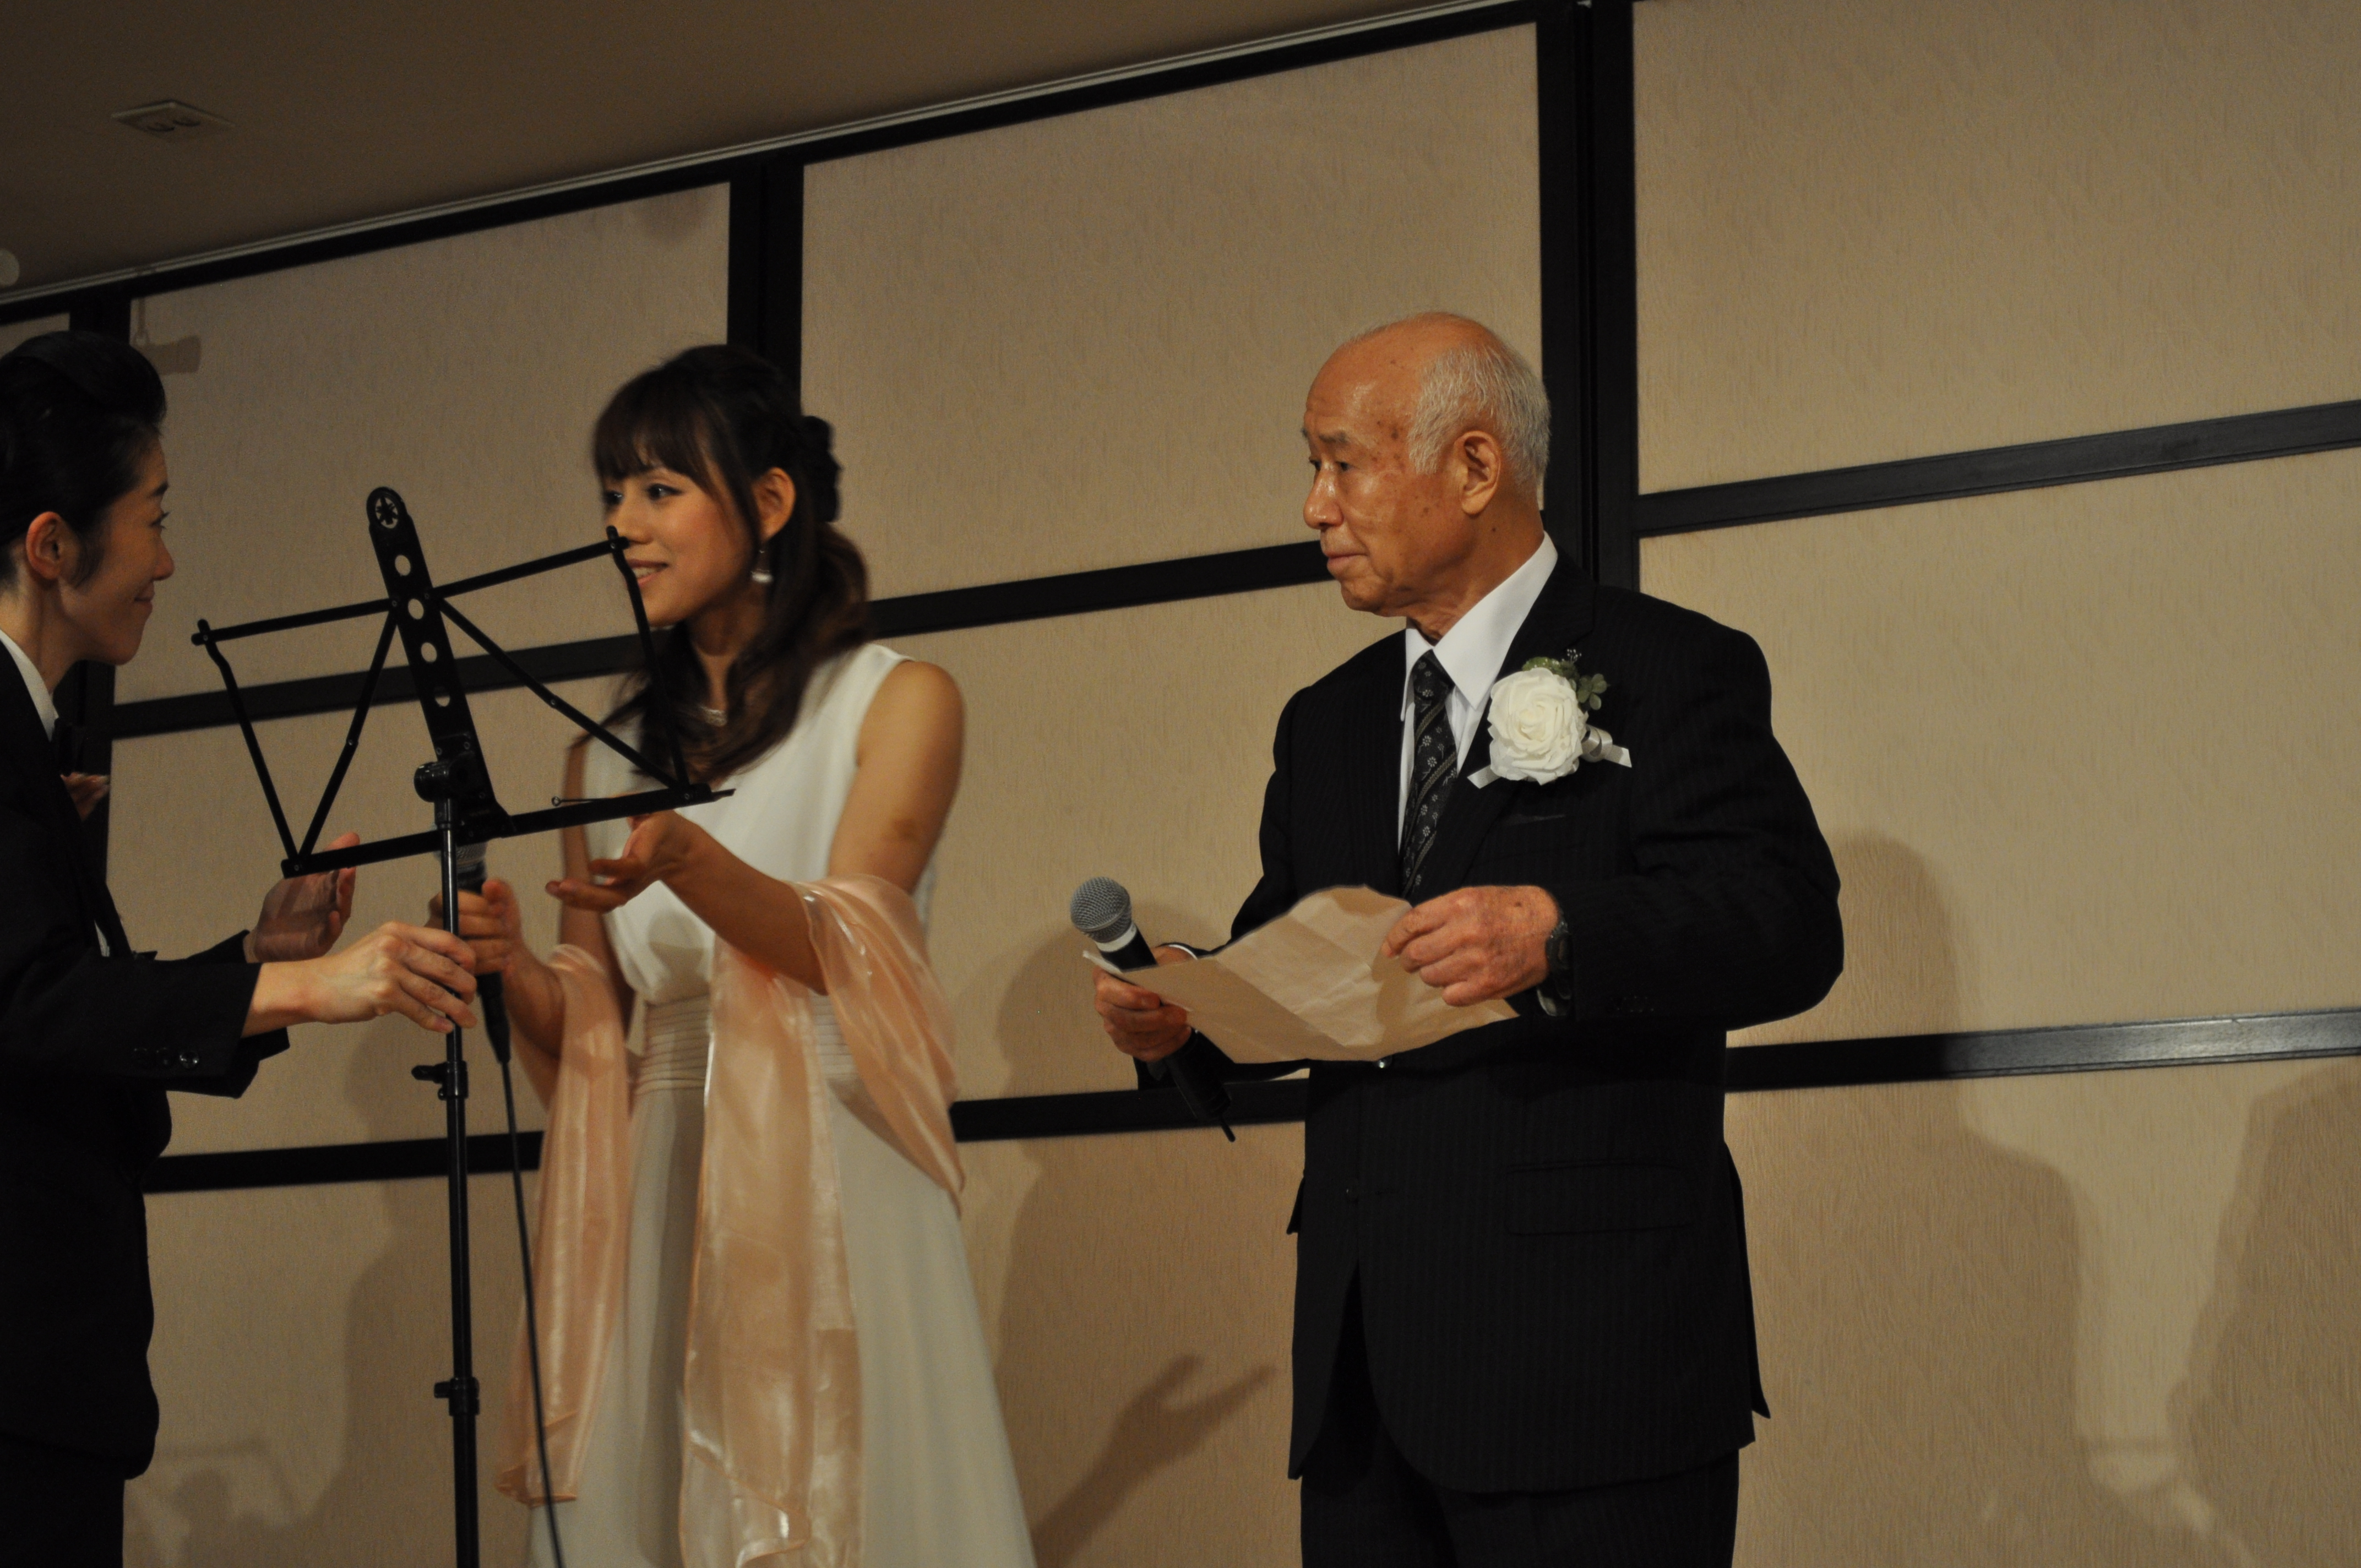 DSC 0492 - 第6回思風会全国大会2018in東京開催